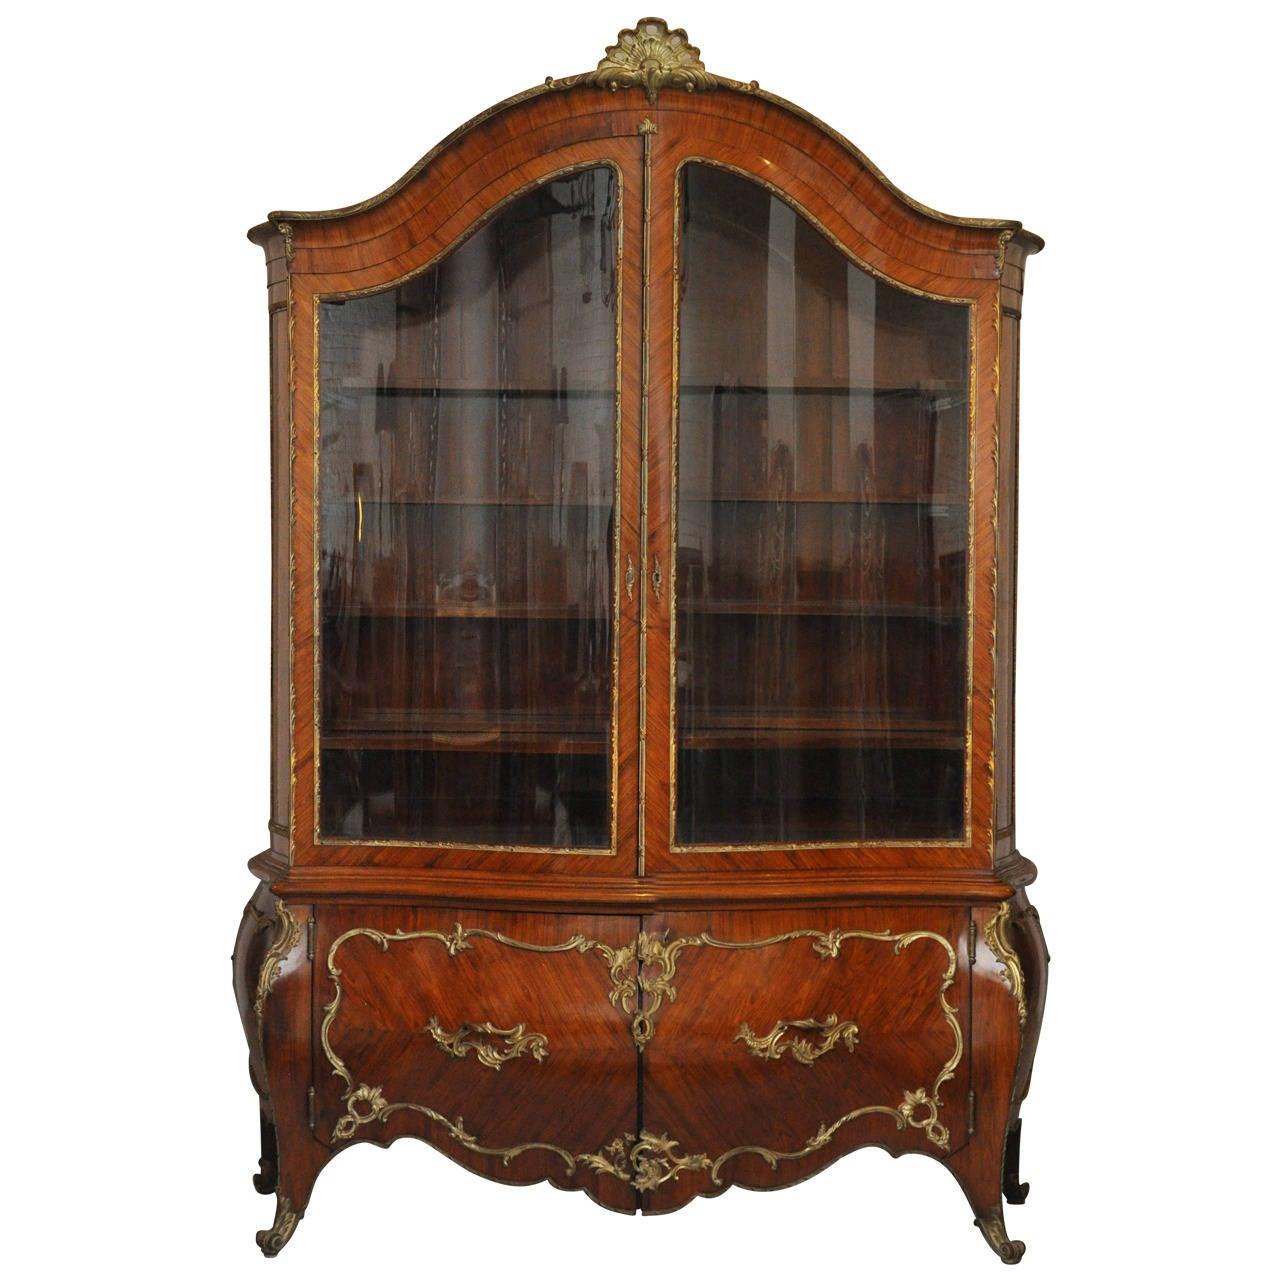 Rococo Bombé Vitrine Bookcase with Gilt Bronze Mounts, France 1880